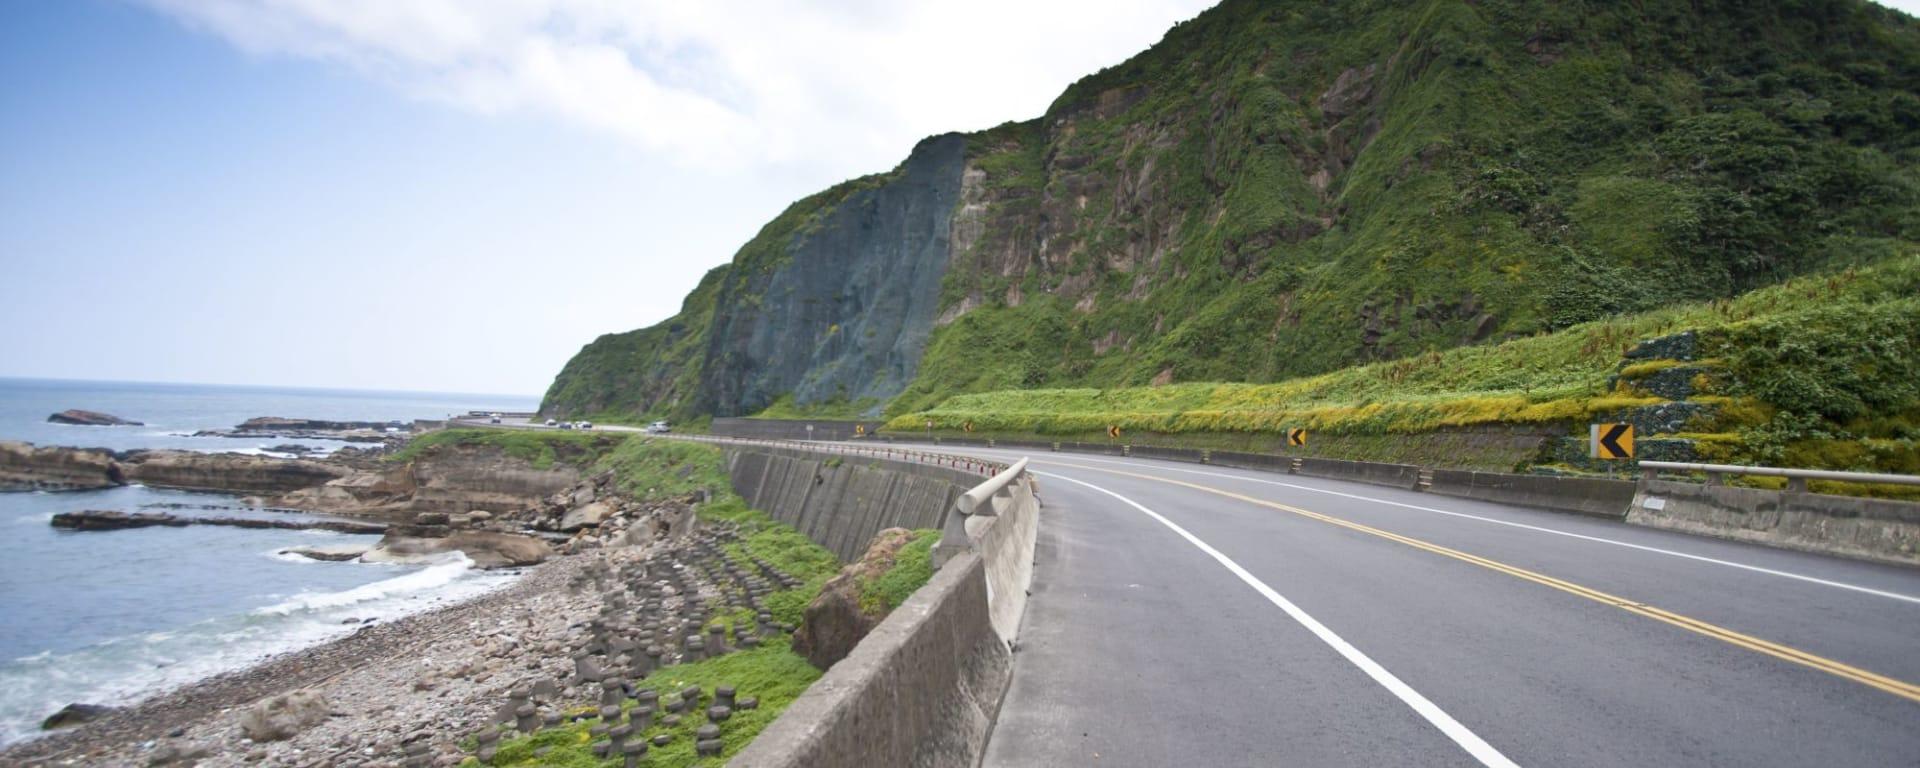 Le meilleur de Taïwan de Taipei: Coastal Road and Sea